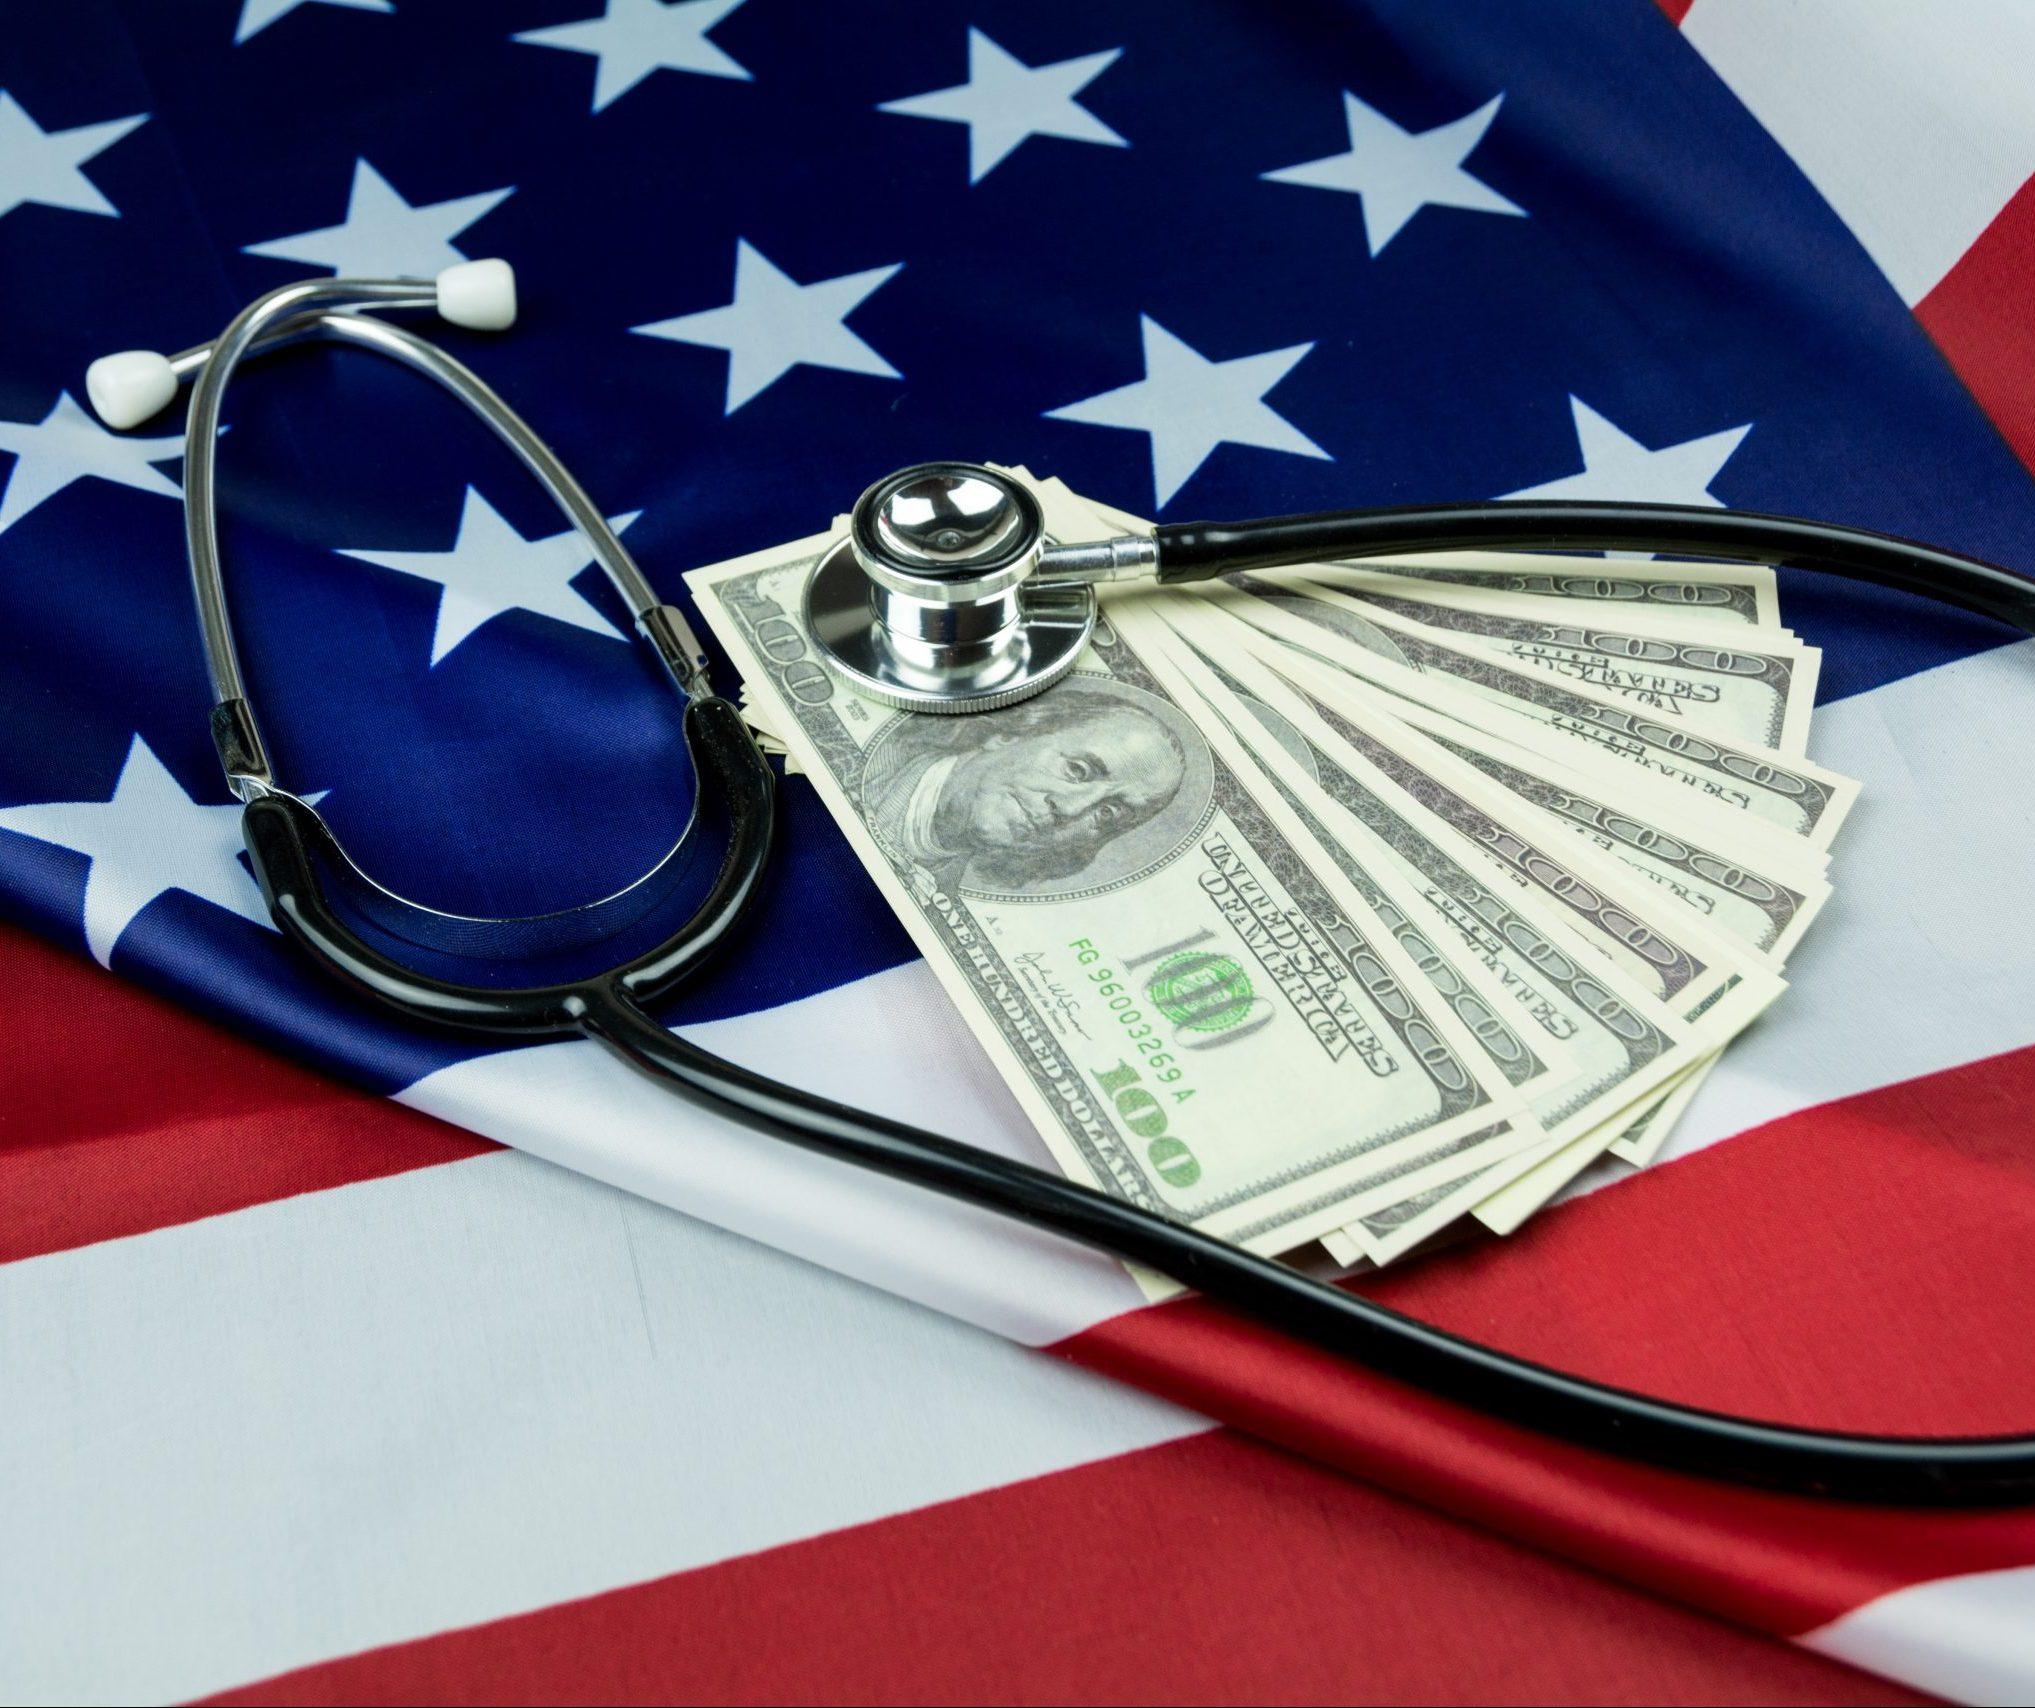 List of Health Insurance Companies